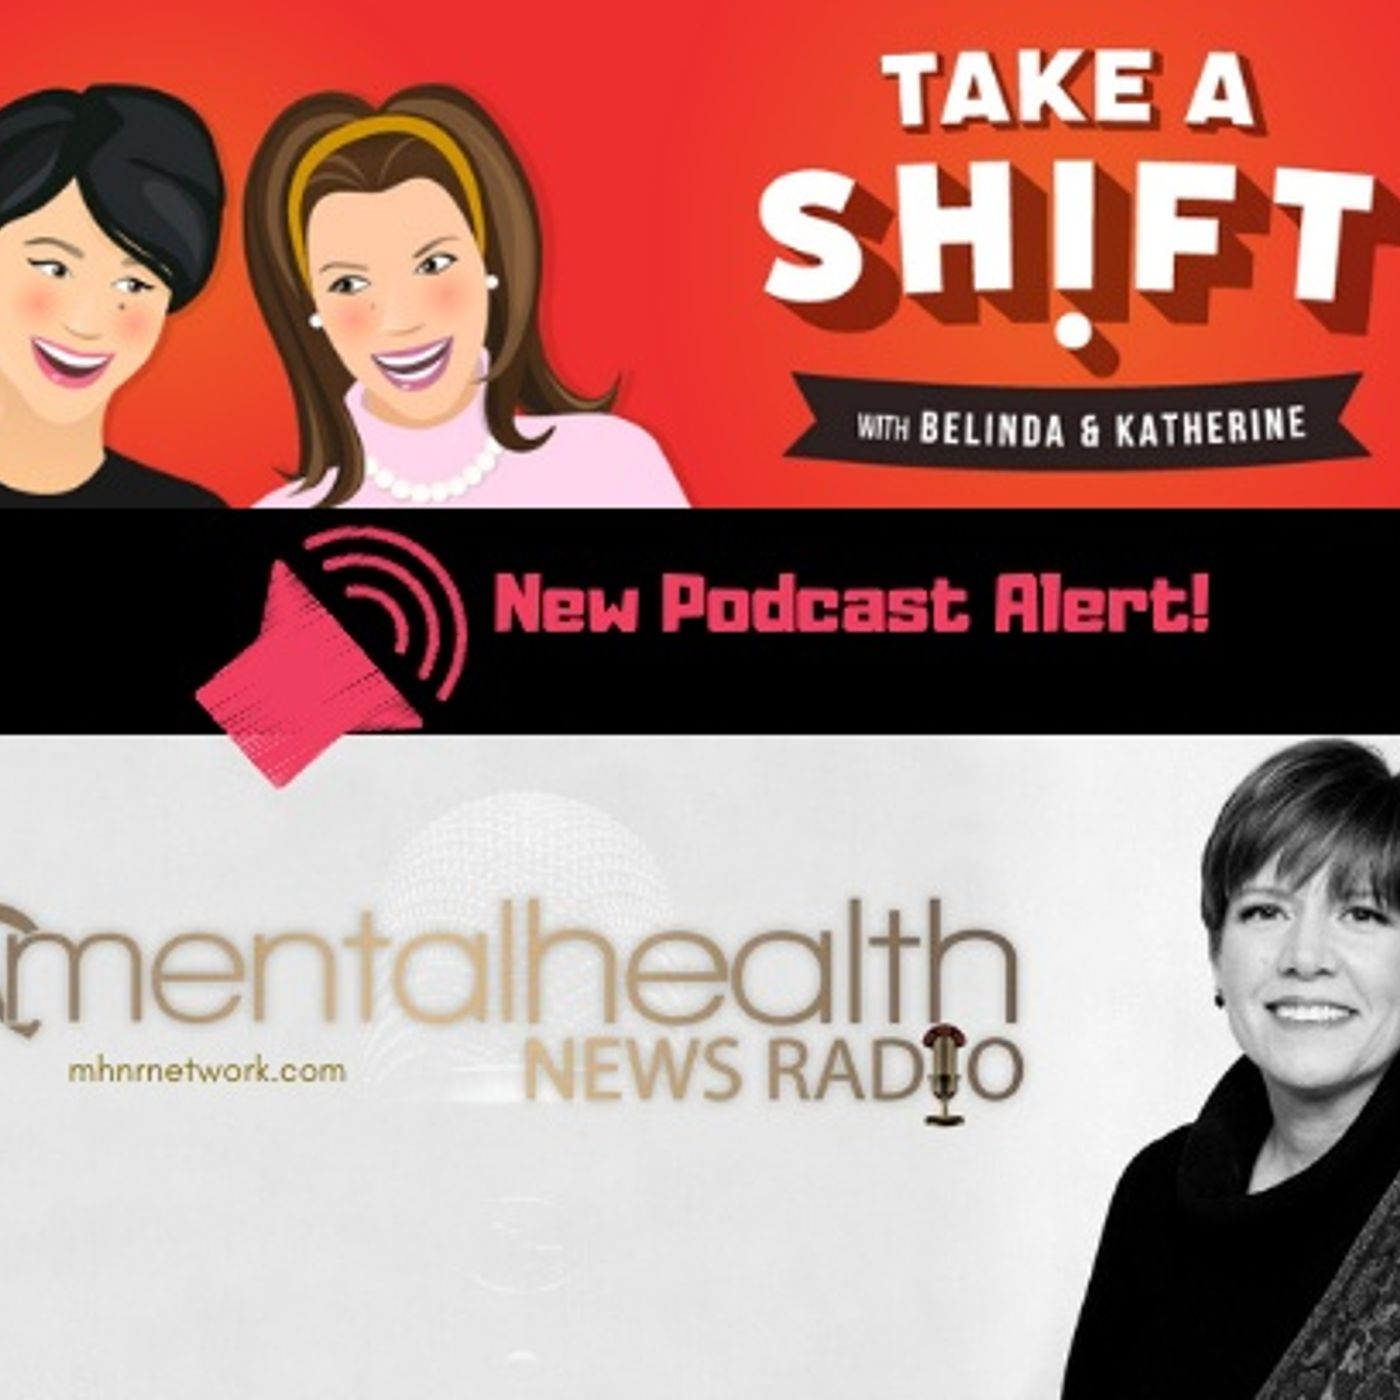 Mental Health News Radio - Take A Shift: Pun Intended